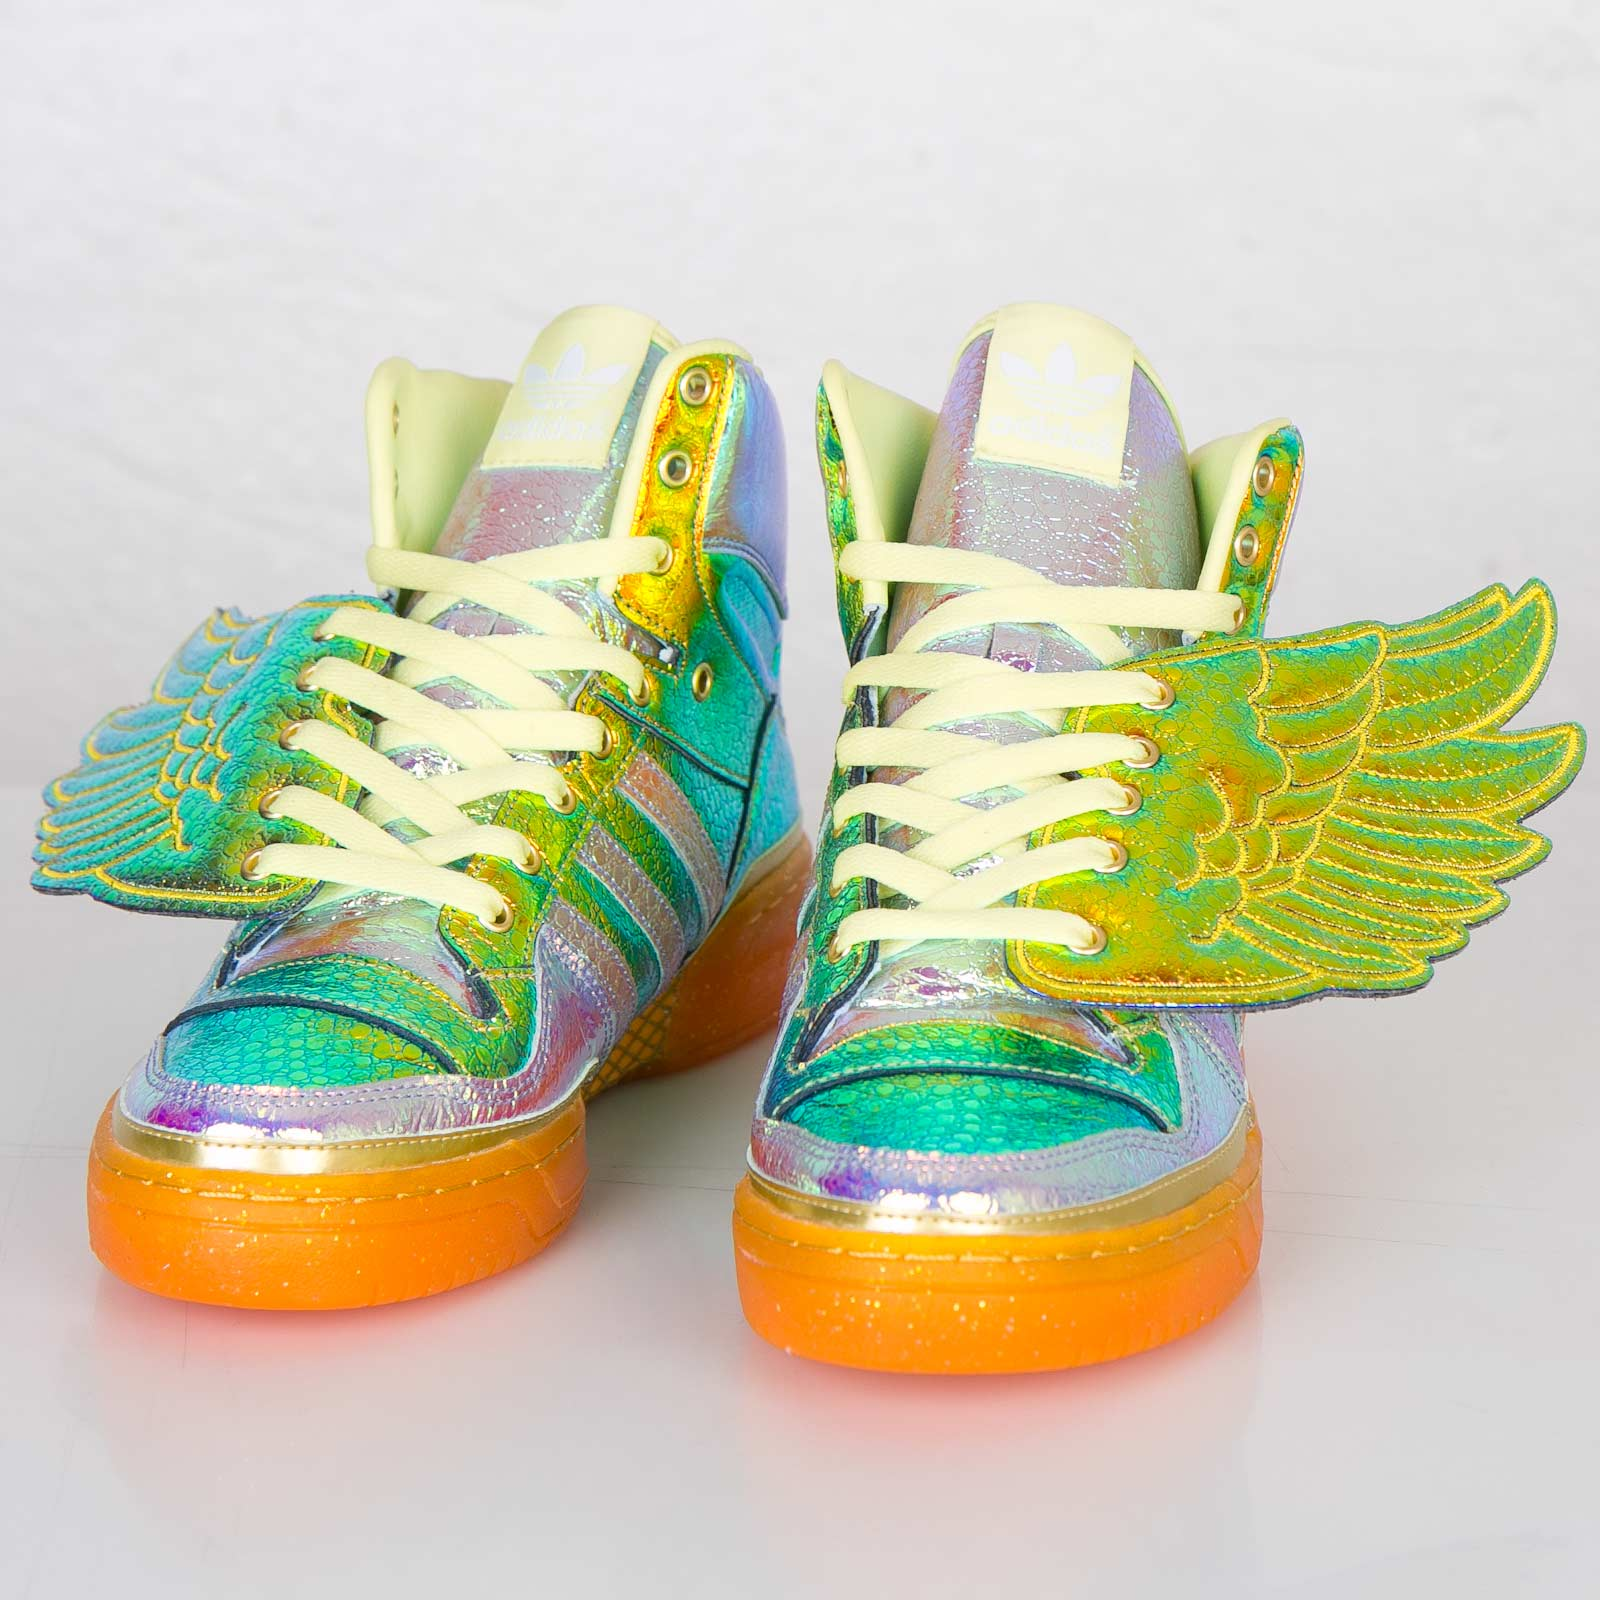 c3fab03d1dfecd adidas JS Foil Wing - D65203 - Sneakersnstuff